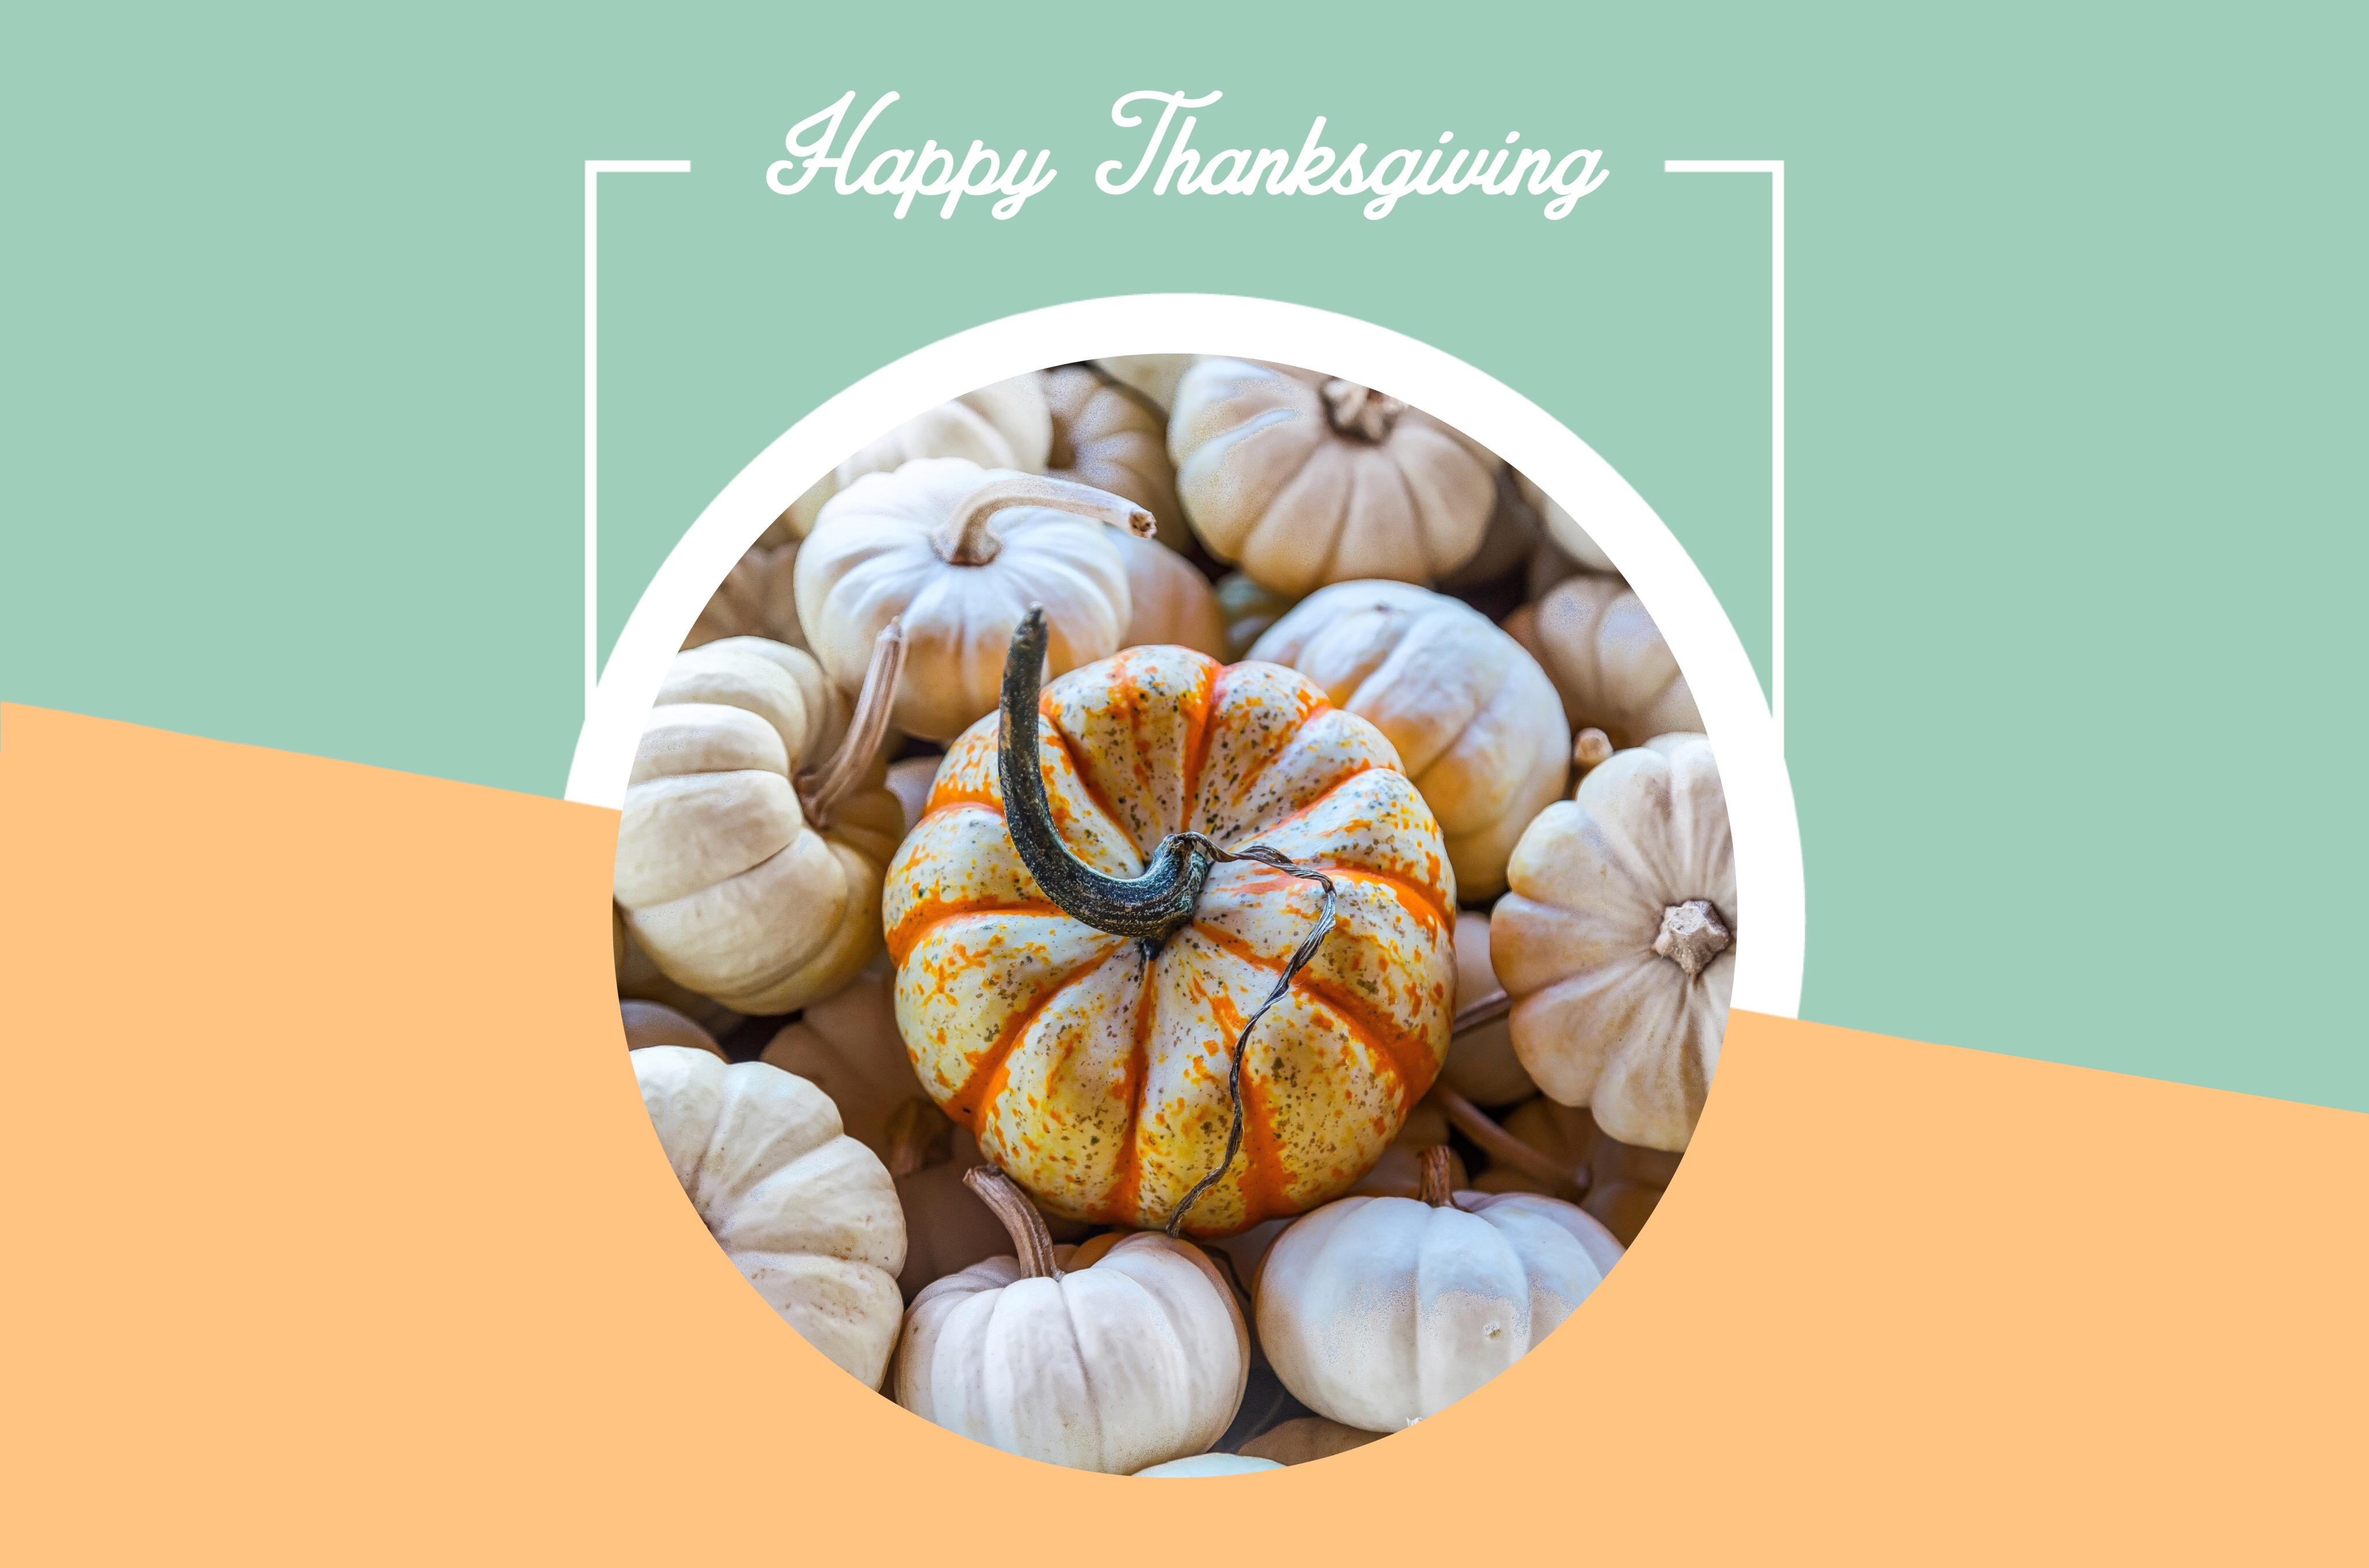 #freetoedit #thanksgiving #happythanksgiving #givethanks #thanksgivingday